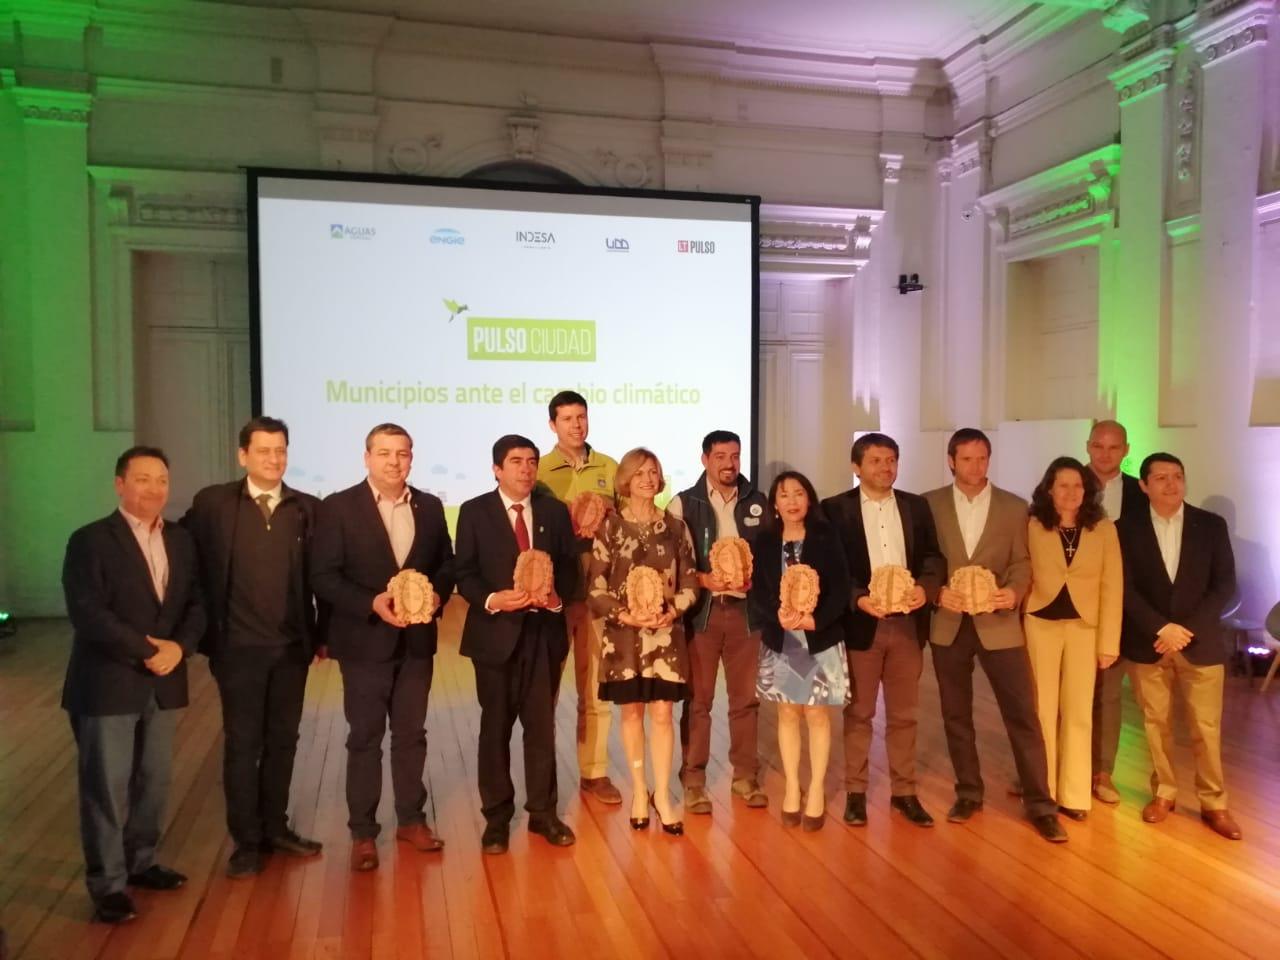 Municipio recibe premio Pulso Ciudad por proyecto Las Pérgolas de Carrascal